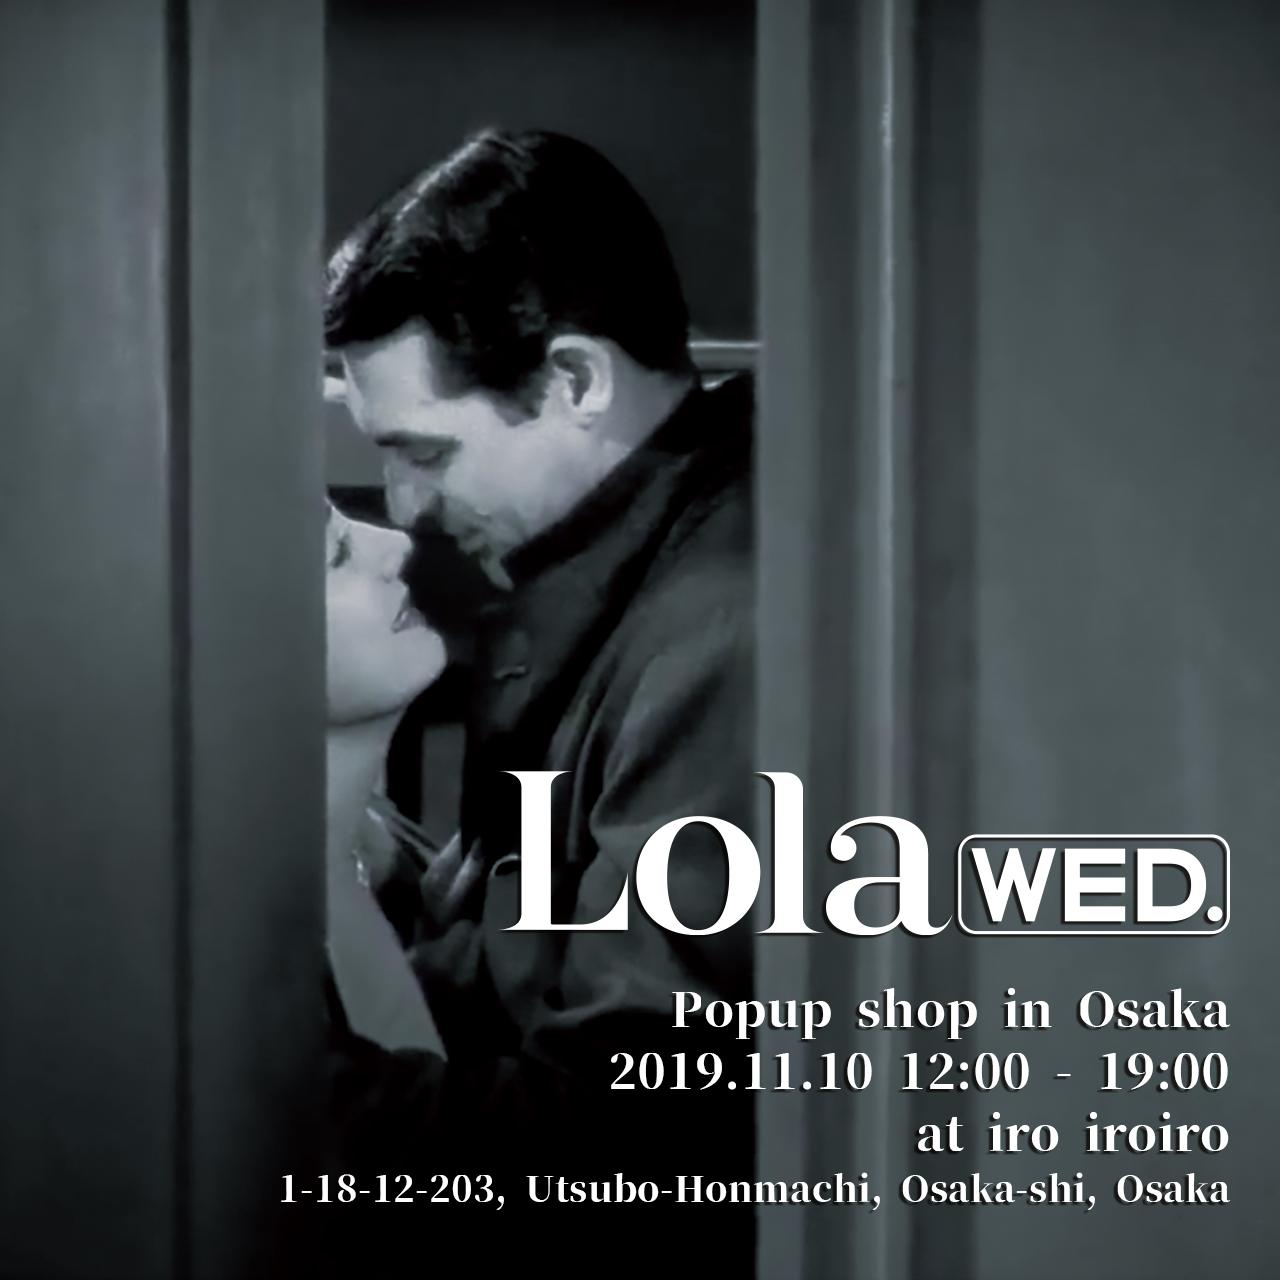 Lola wed. 大阪ポップアップショップのお知らせ